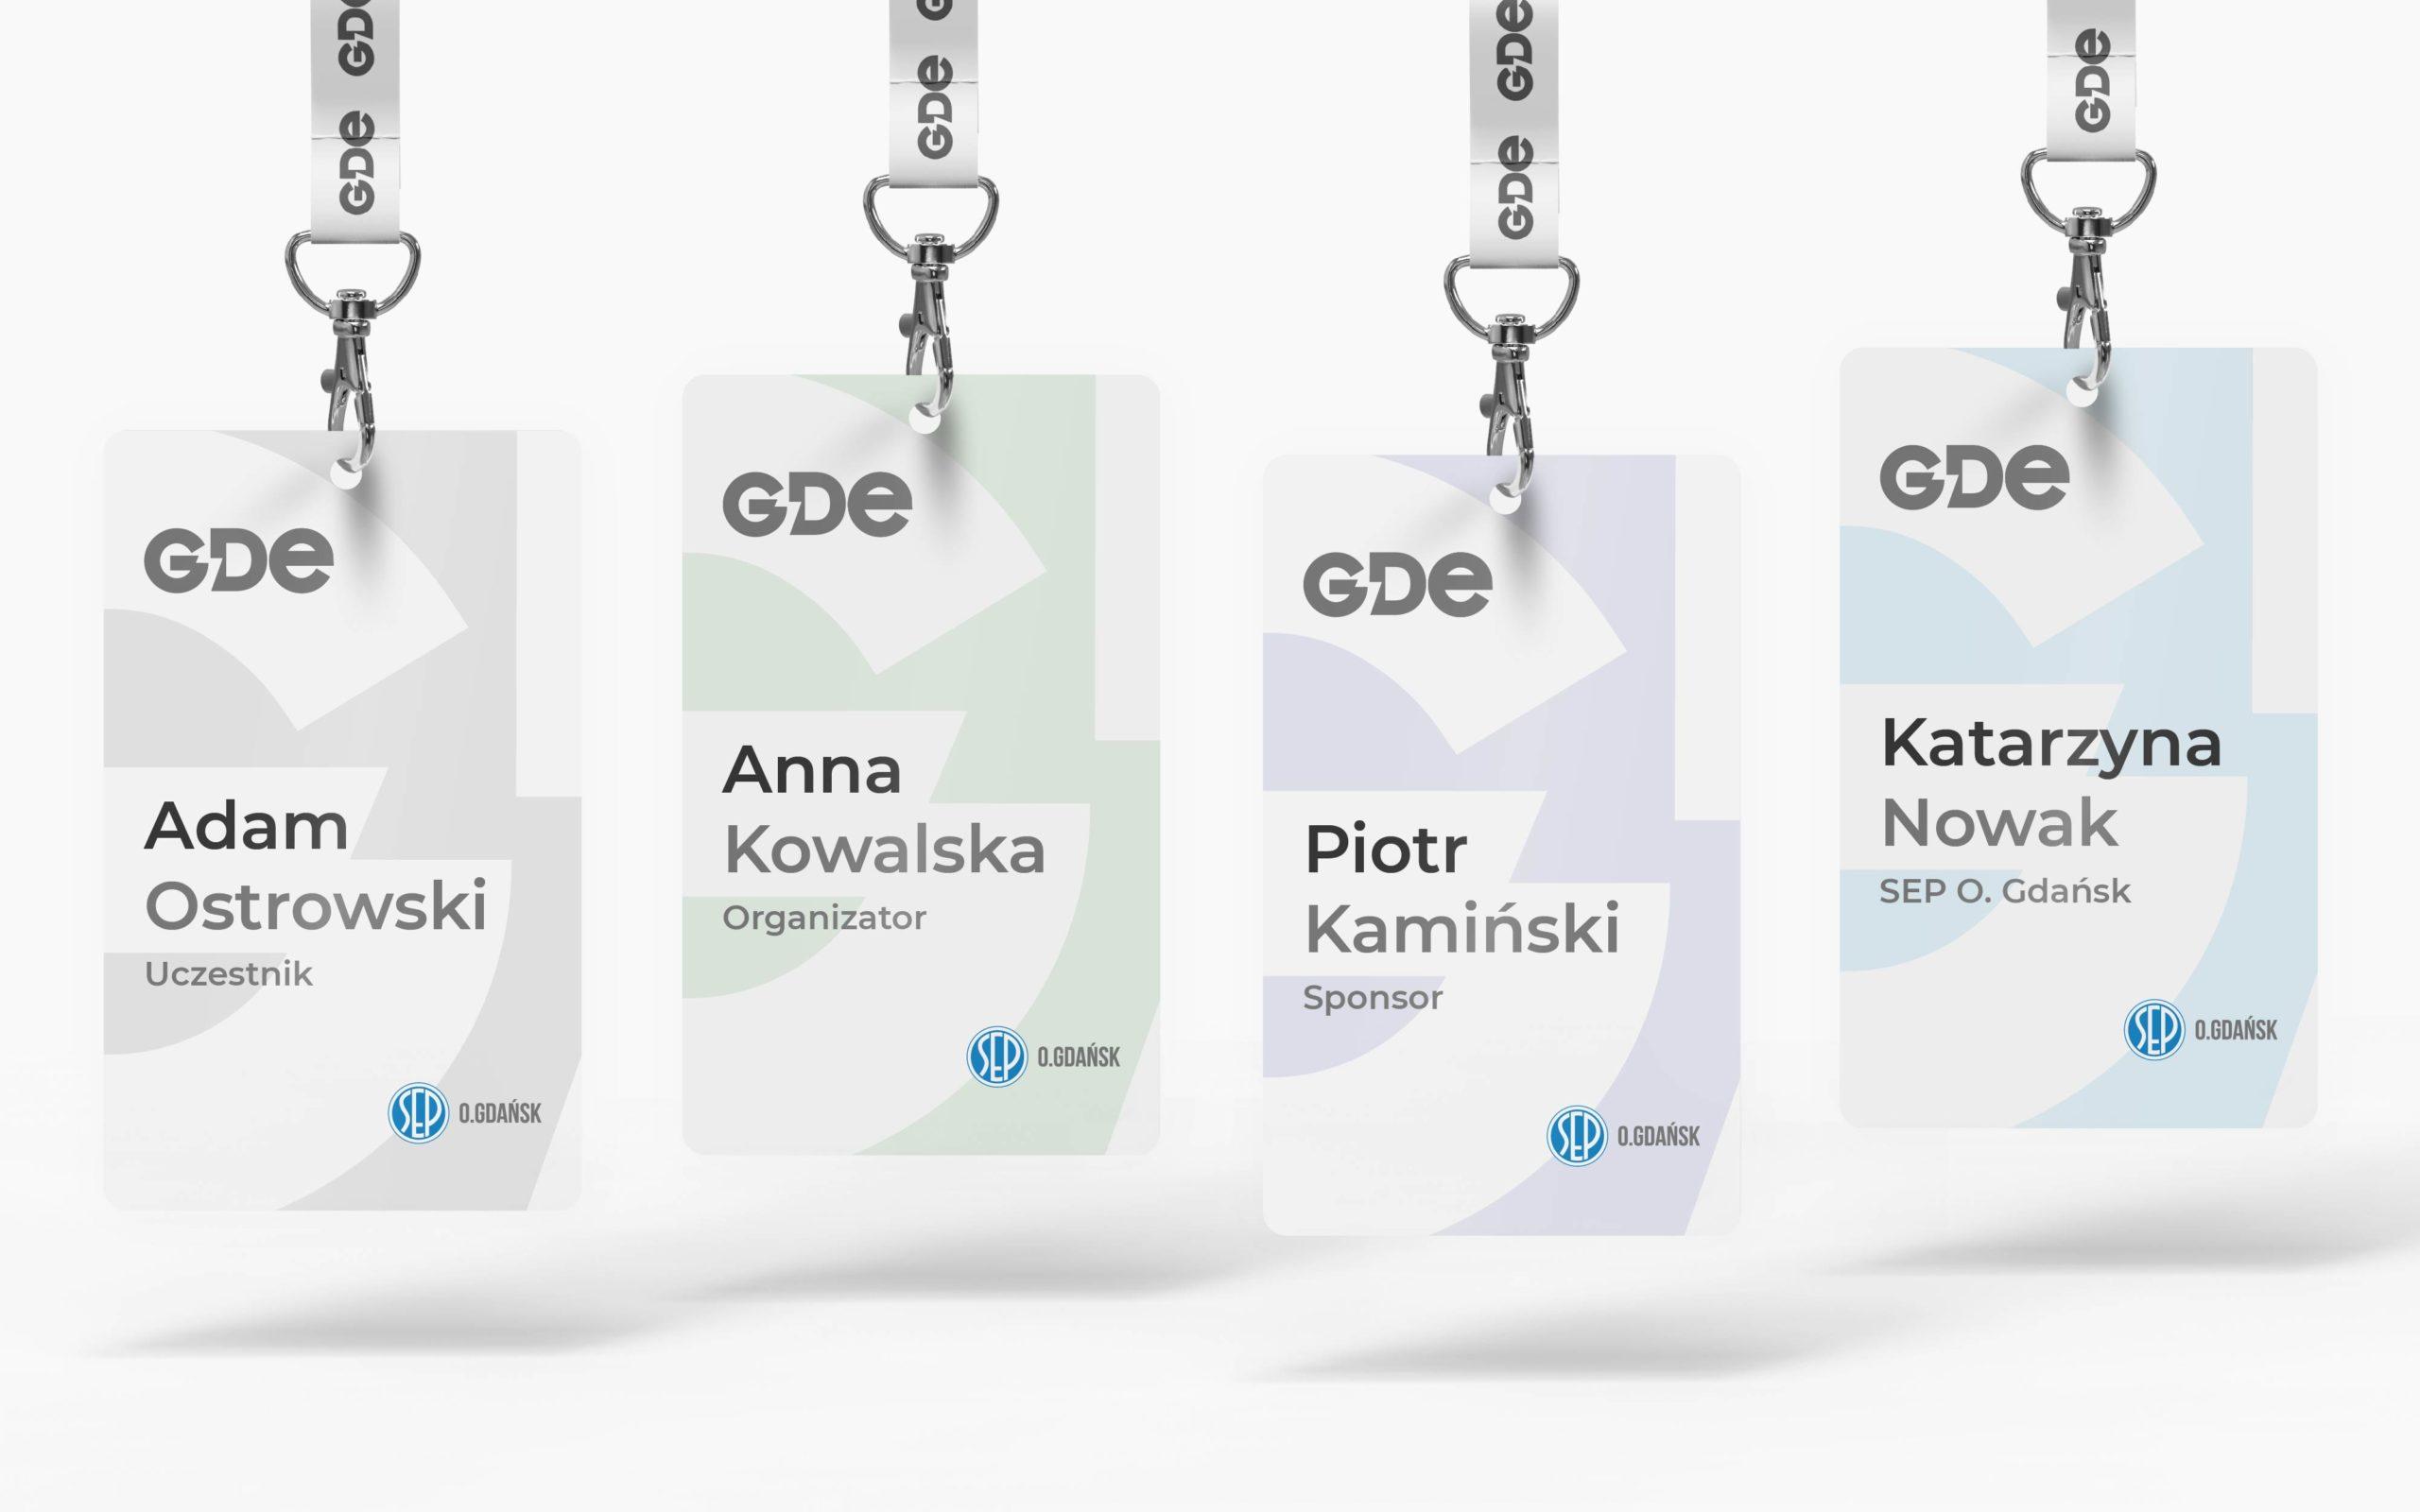 GDE 2019 - Badge